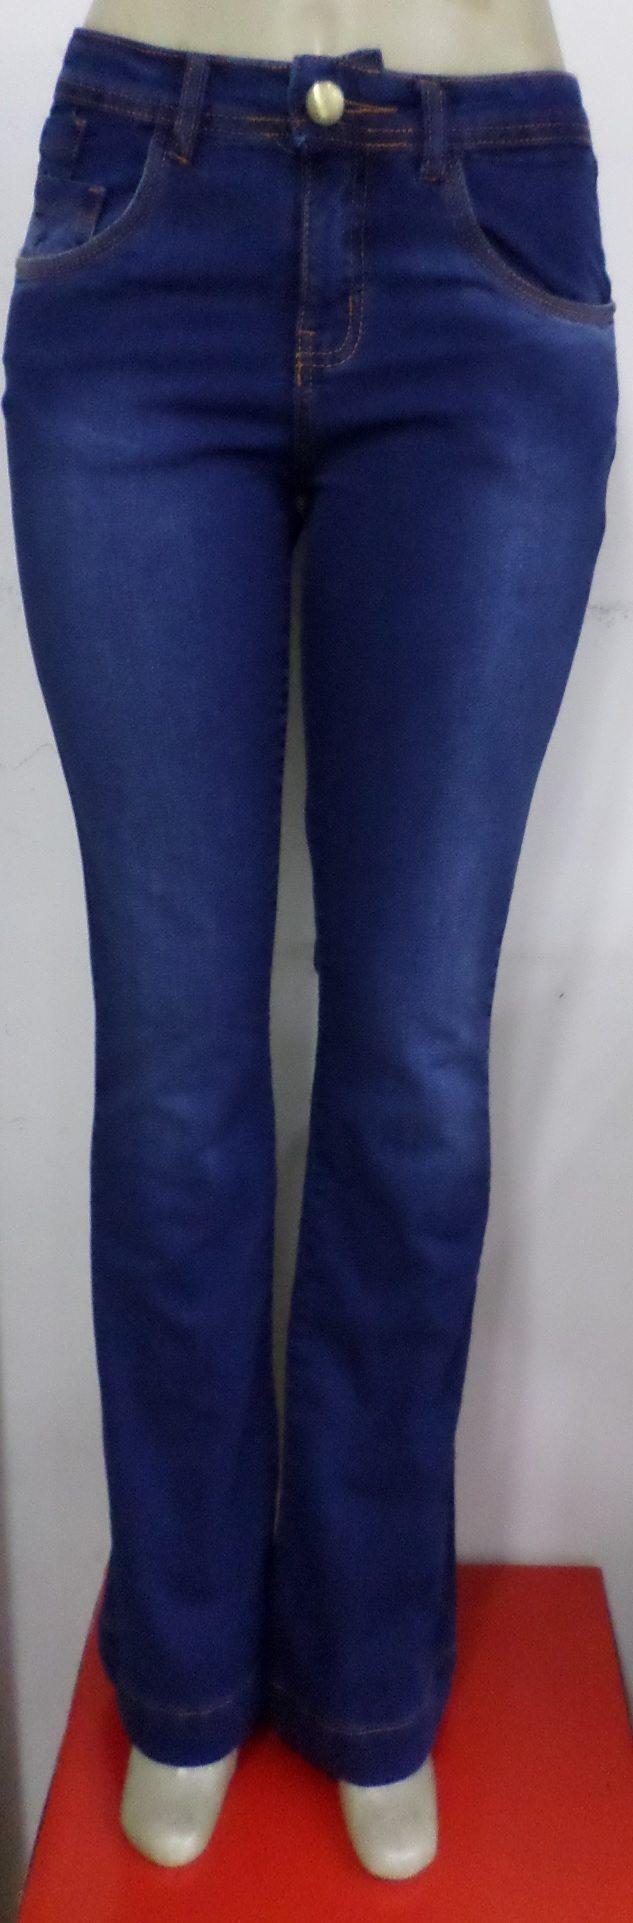 Calça Feminina Black Jeans Boca Larga - R 79 e8b3887a3b5